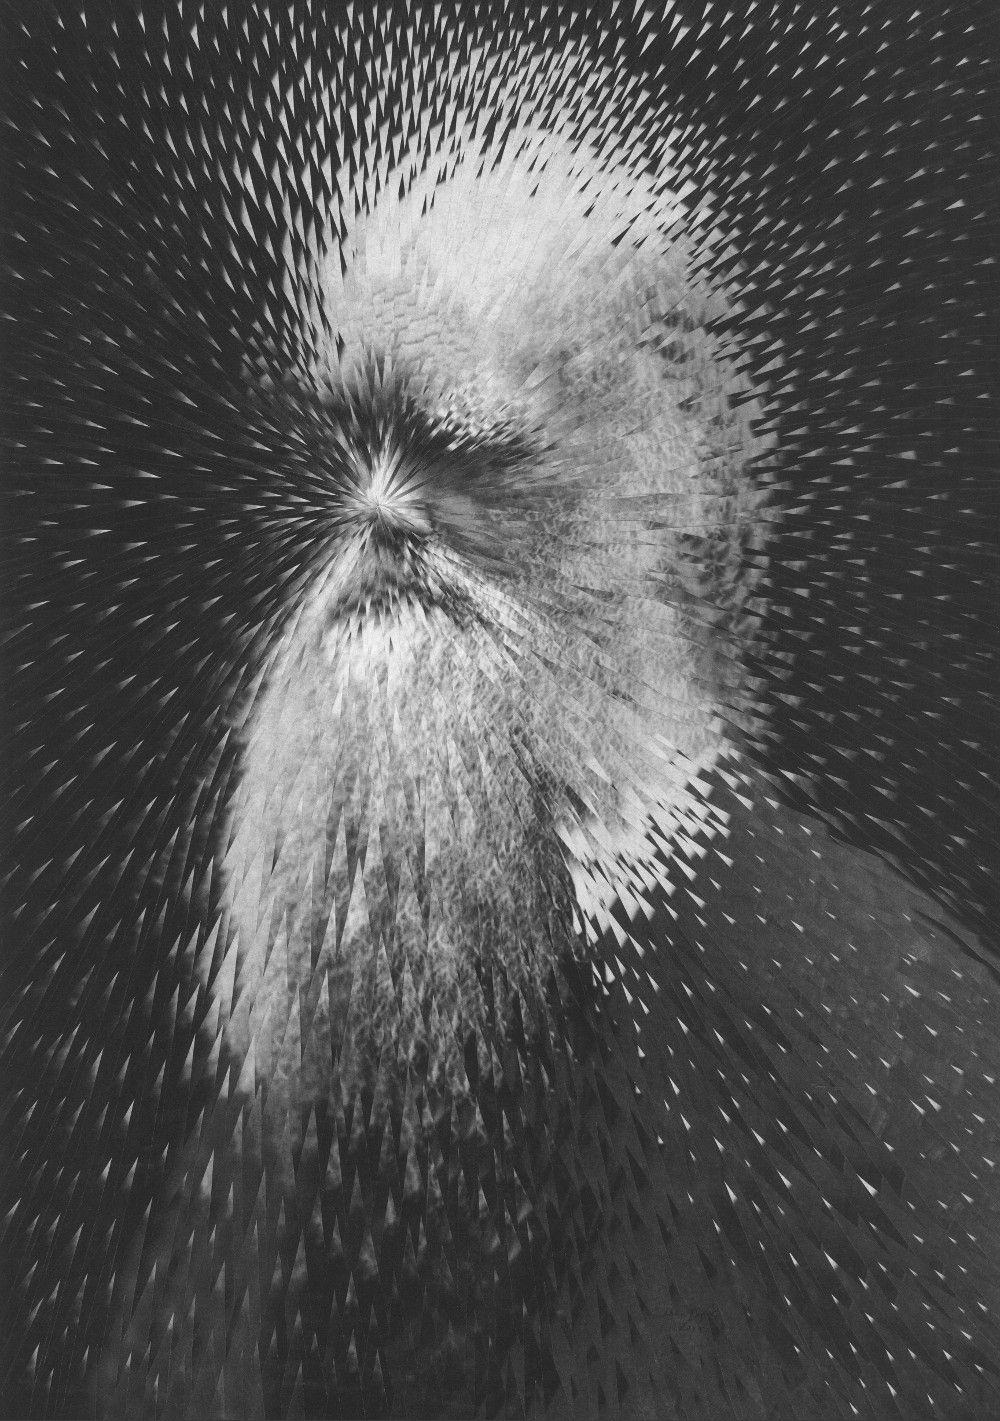 exploding-charles-darwin-lola-dupre